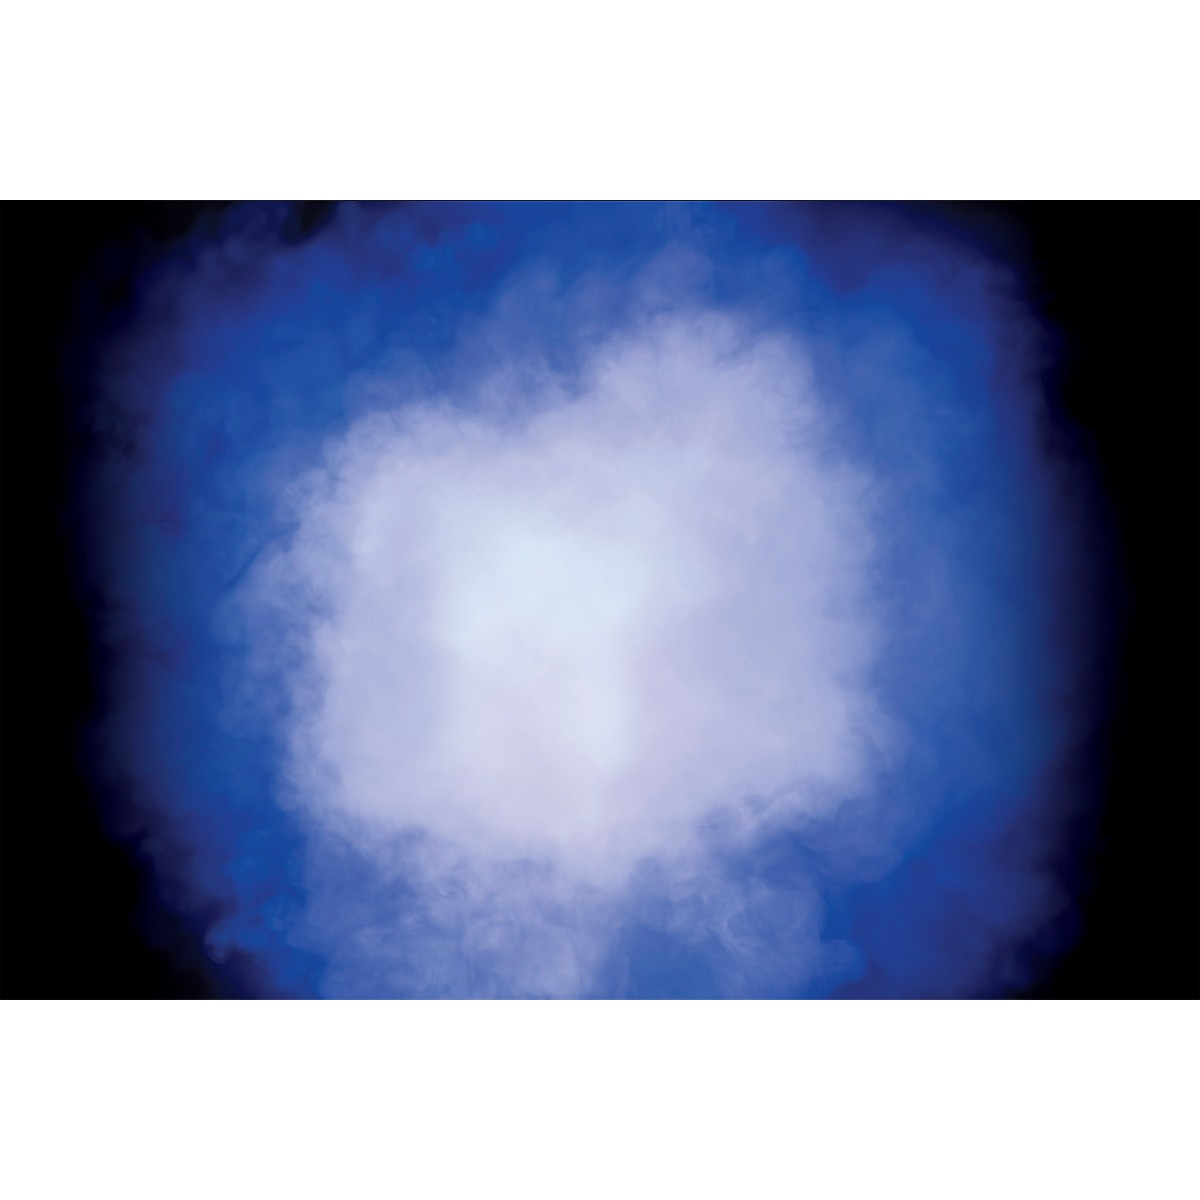 Black Label Thick Myst High Density Fog Juice - 55 Gallon